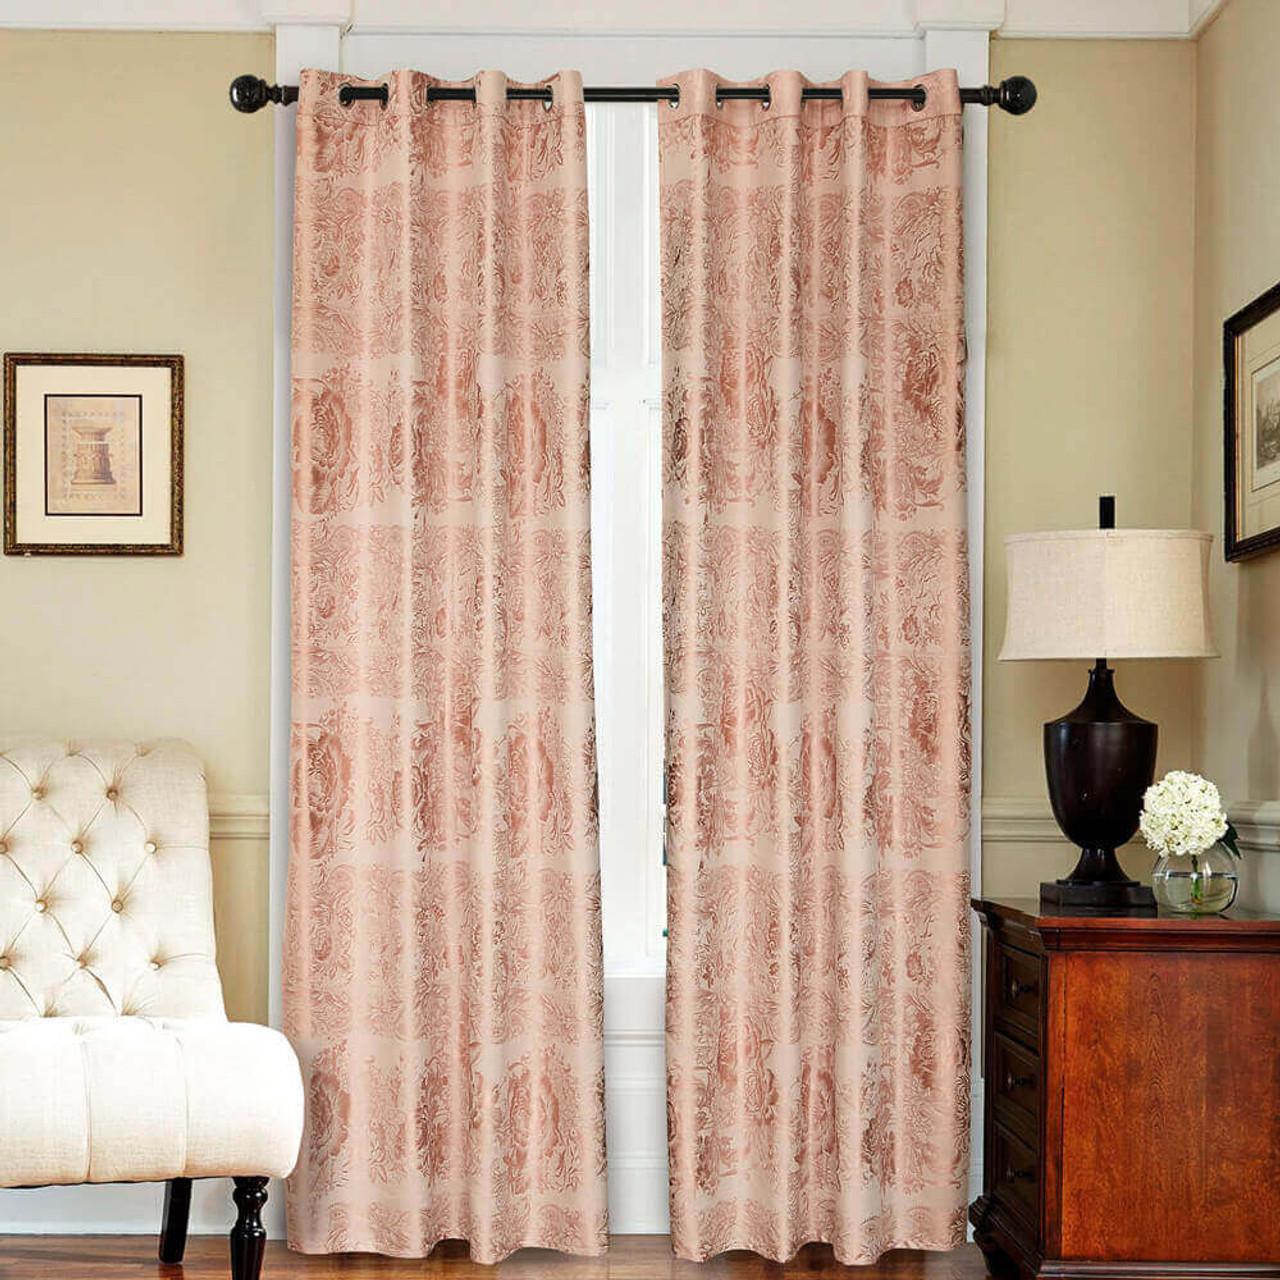 Drop-Shipping Curtain Panel Semi-Blackout Drapes, DMC717 Dolce Mela